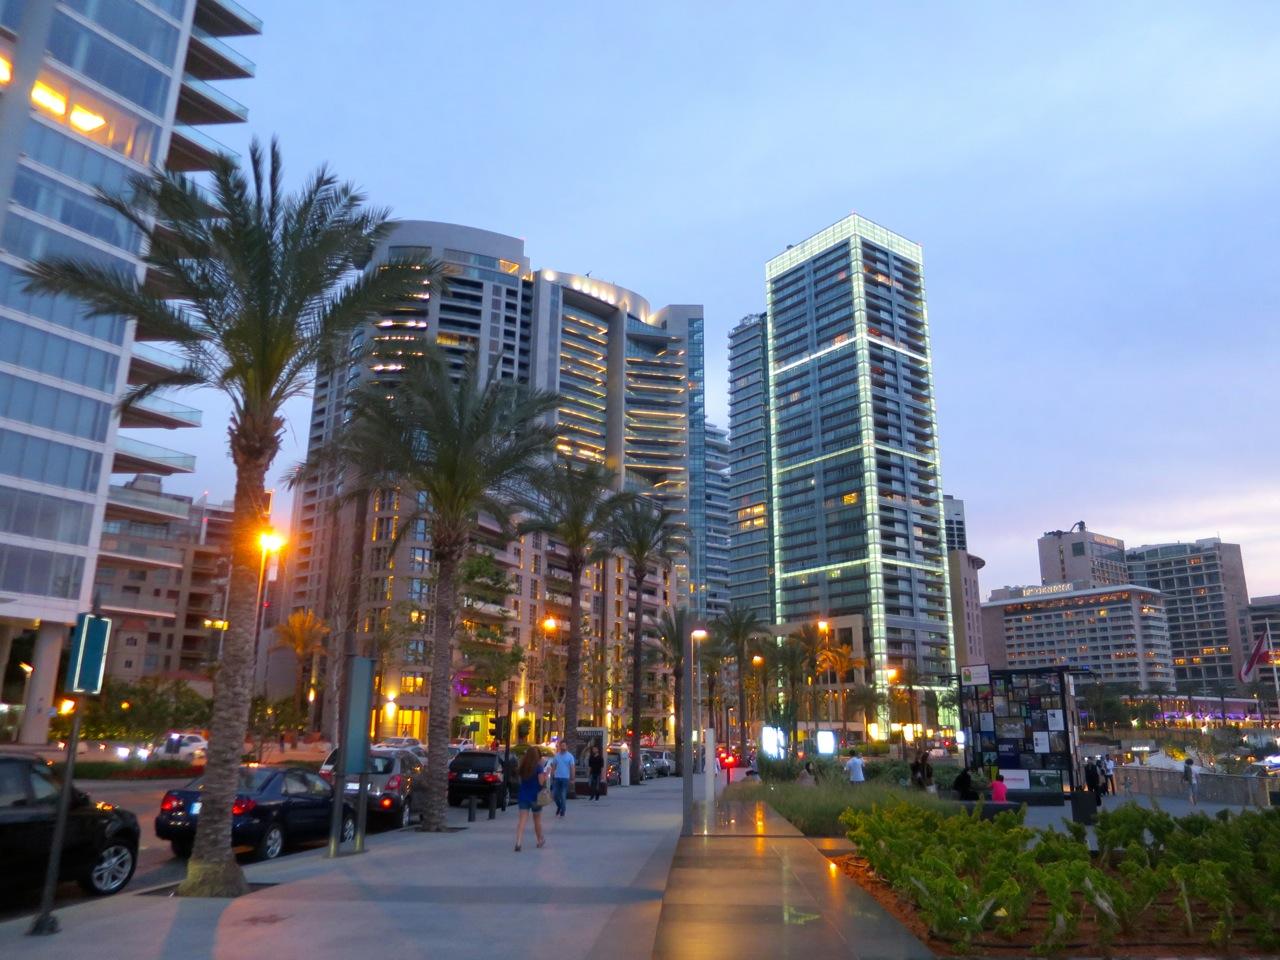 Beirute 2-02